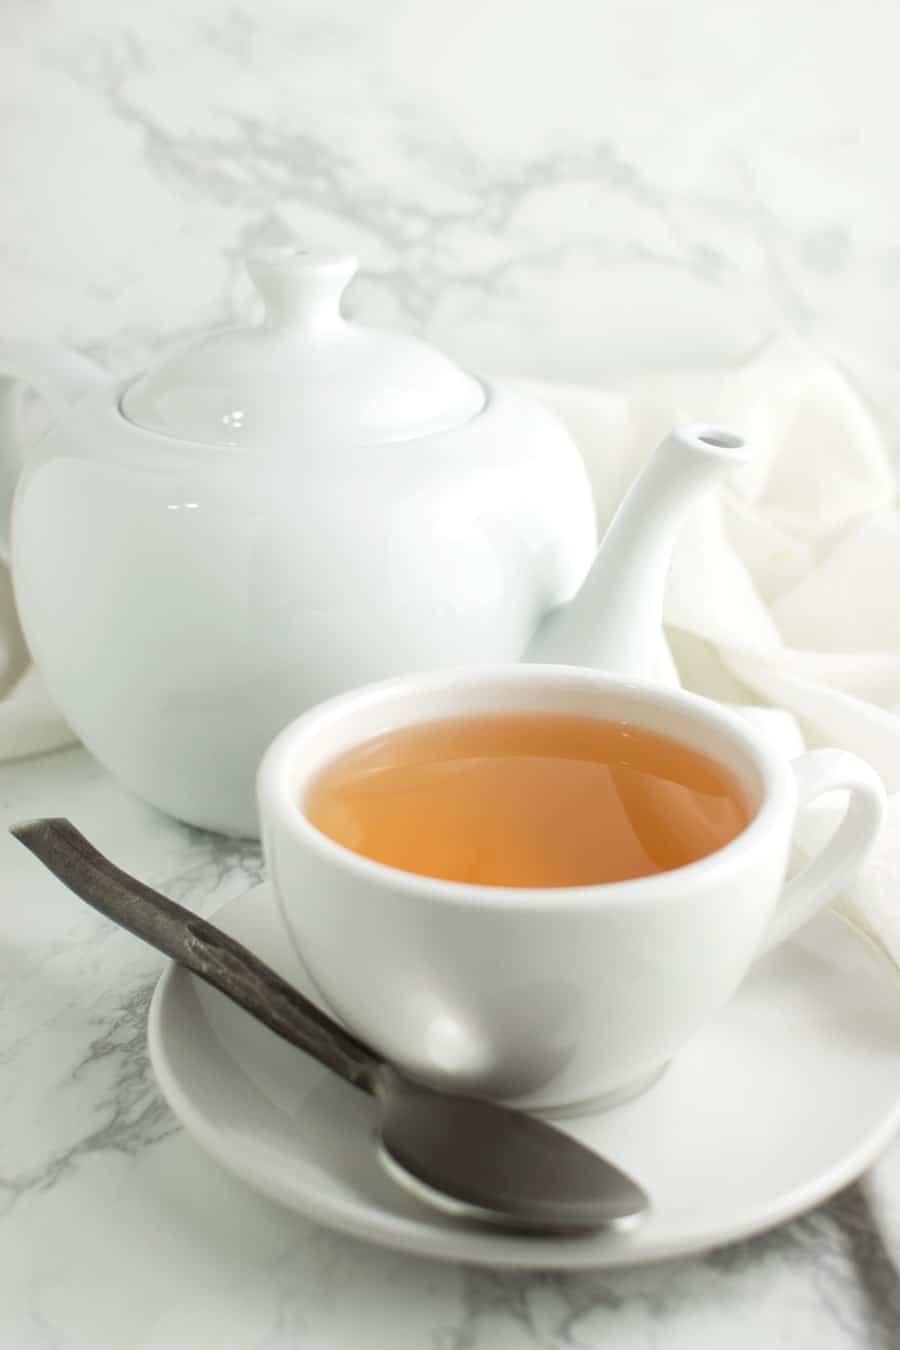 Ginger Tea recipe from acleanplate.com #aip #paleo #autoimmuneprotocol